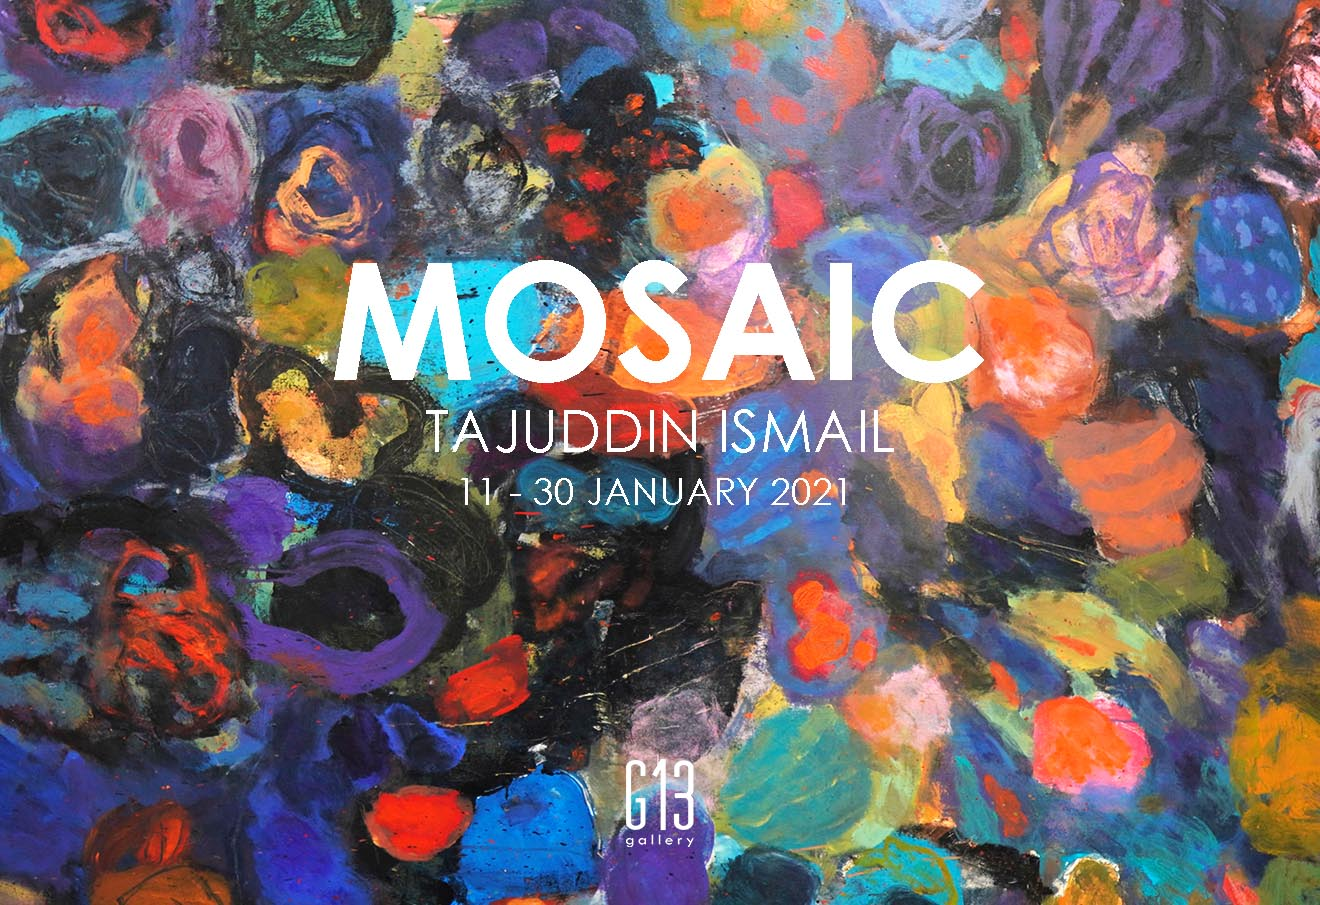 MOSAIC BY TAJUDDIN ISMAIL